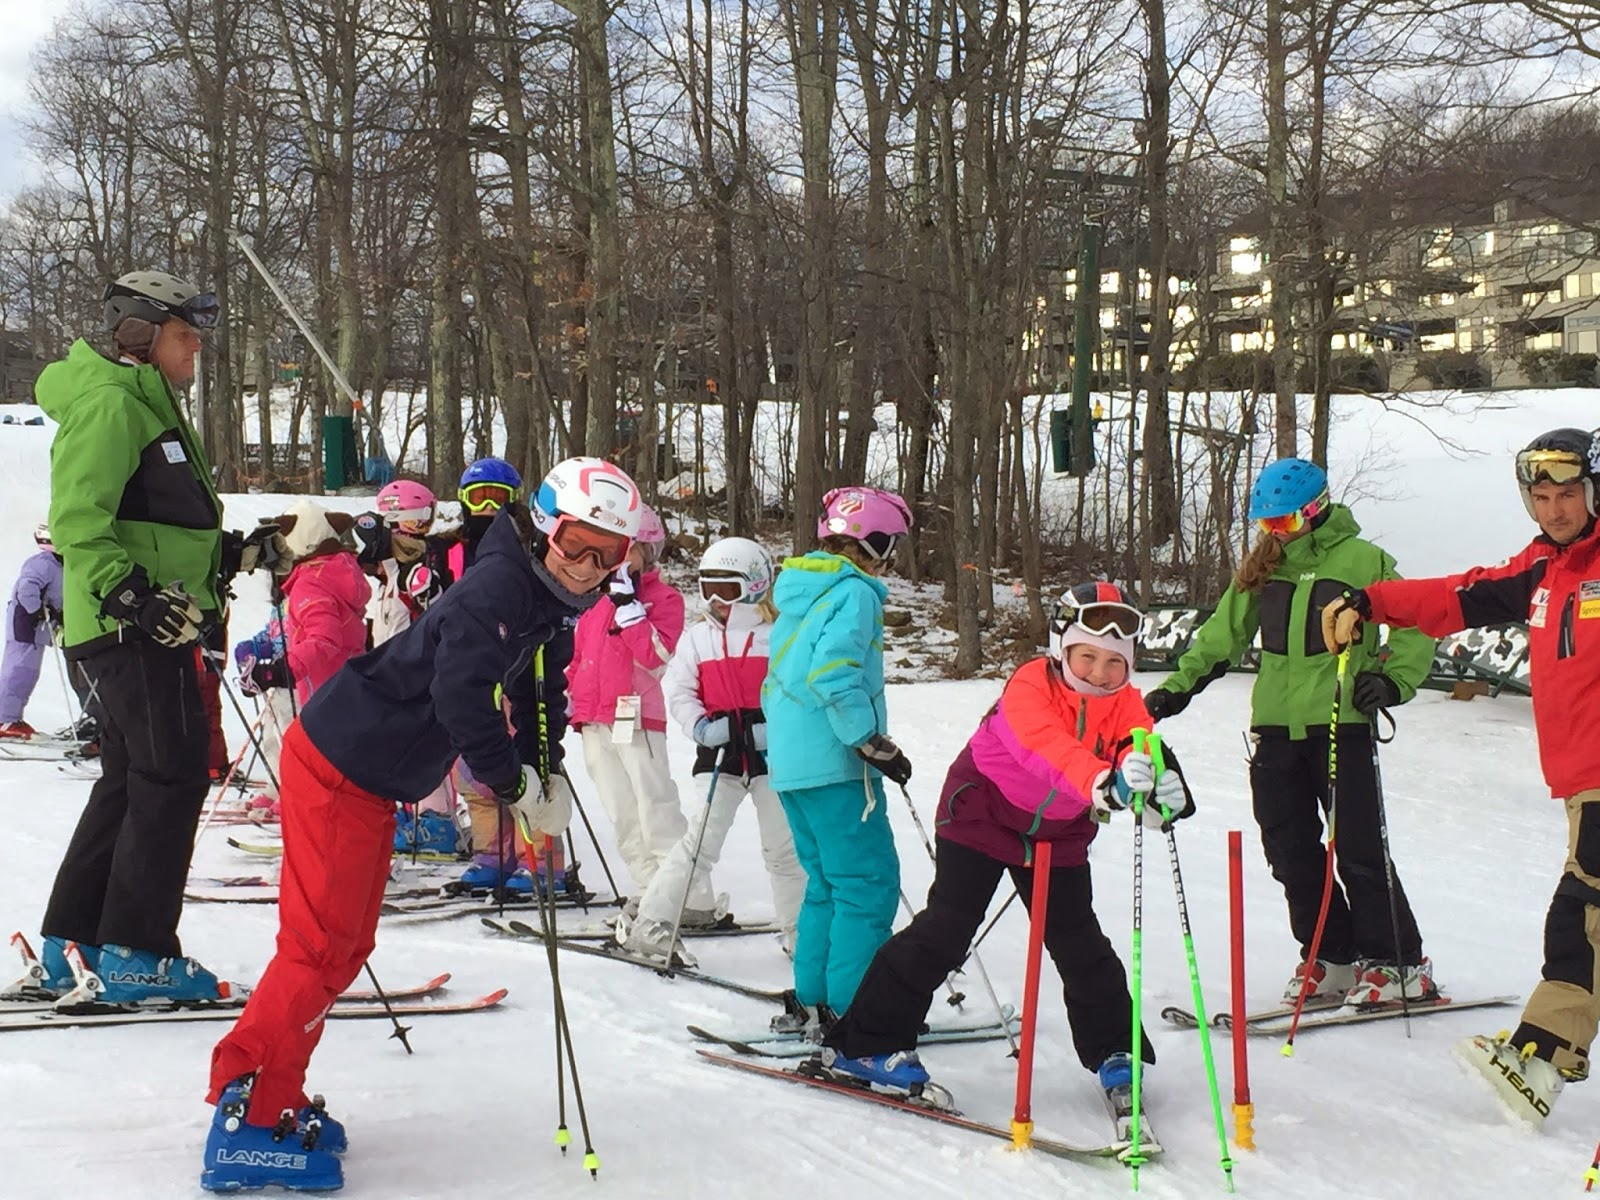 Wintergreen Race Team, development team, Megan McJames, Olympian, Virginia